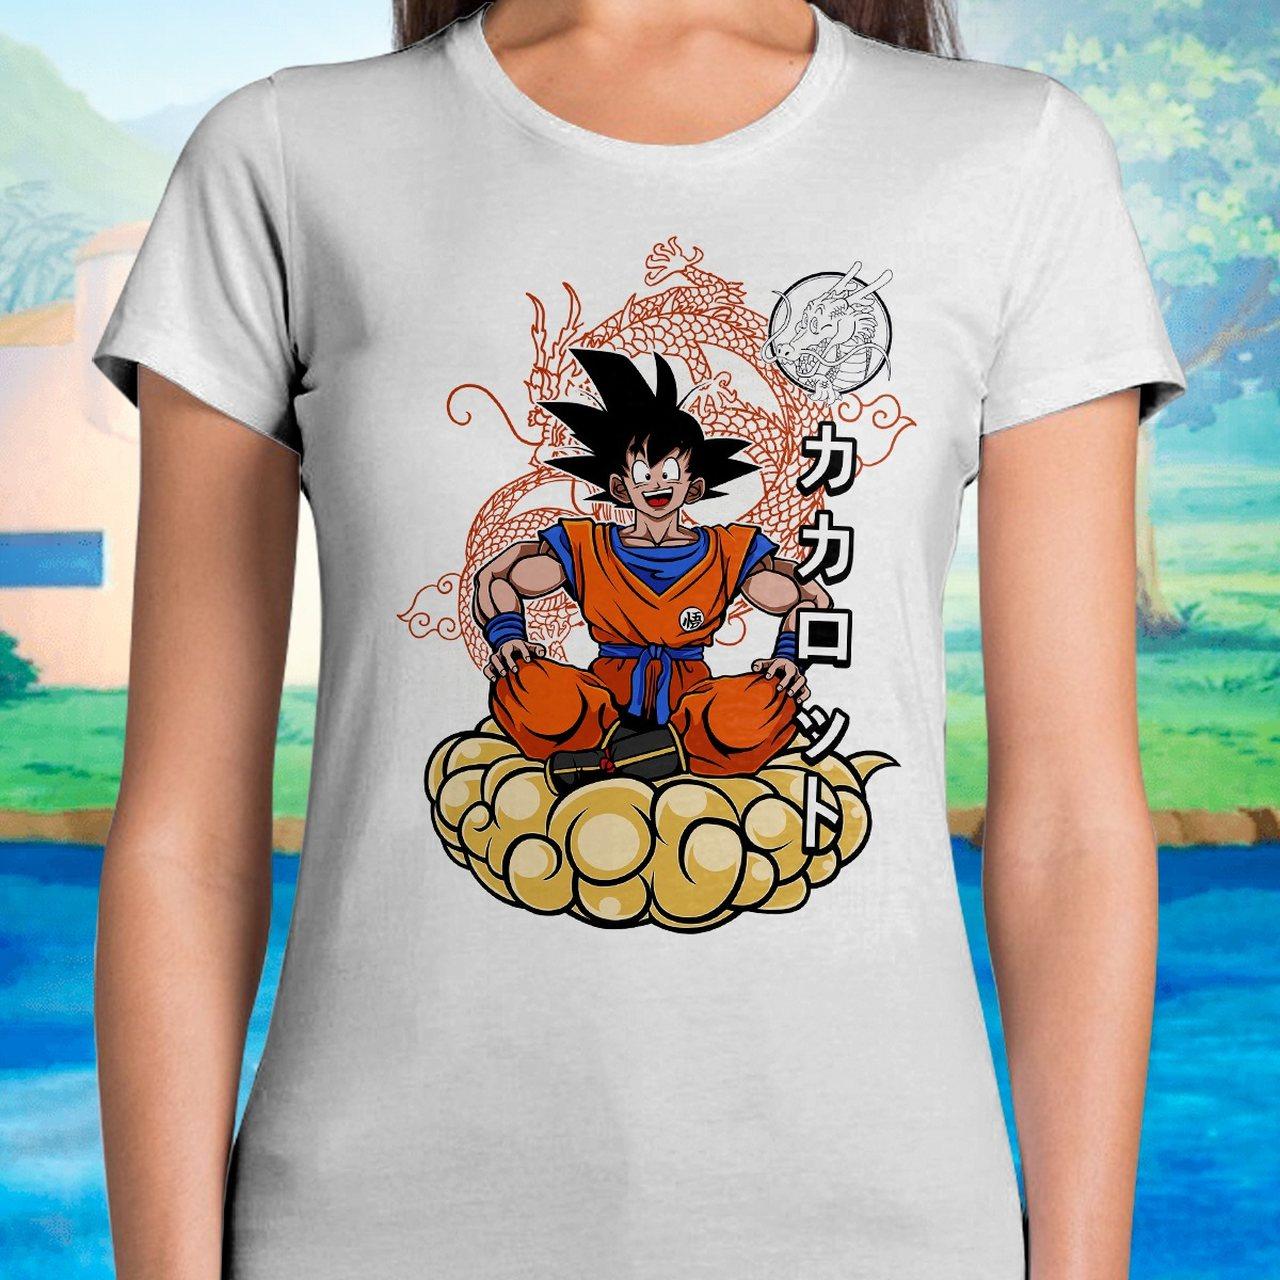 Camiseta Feminina: